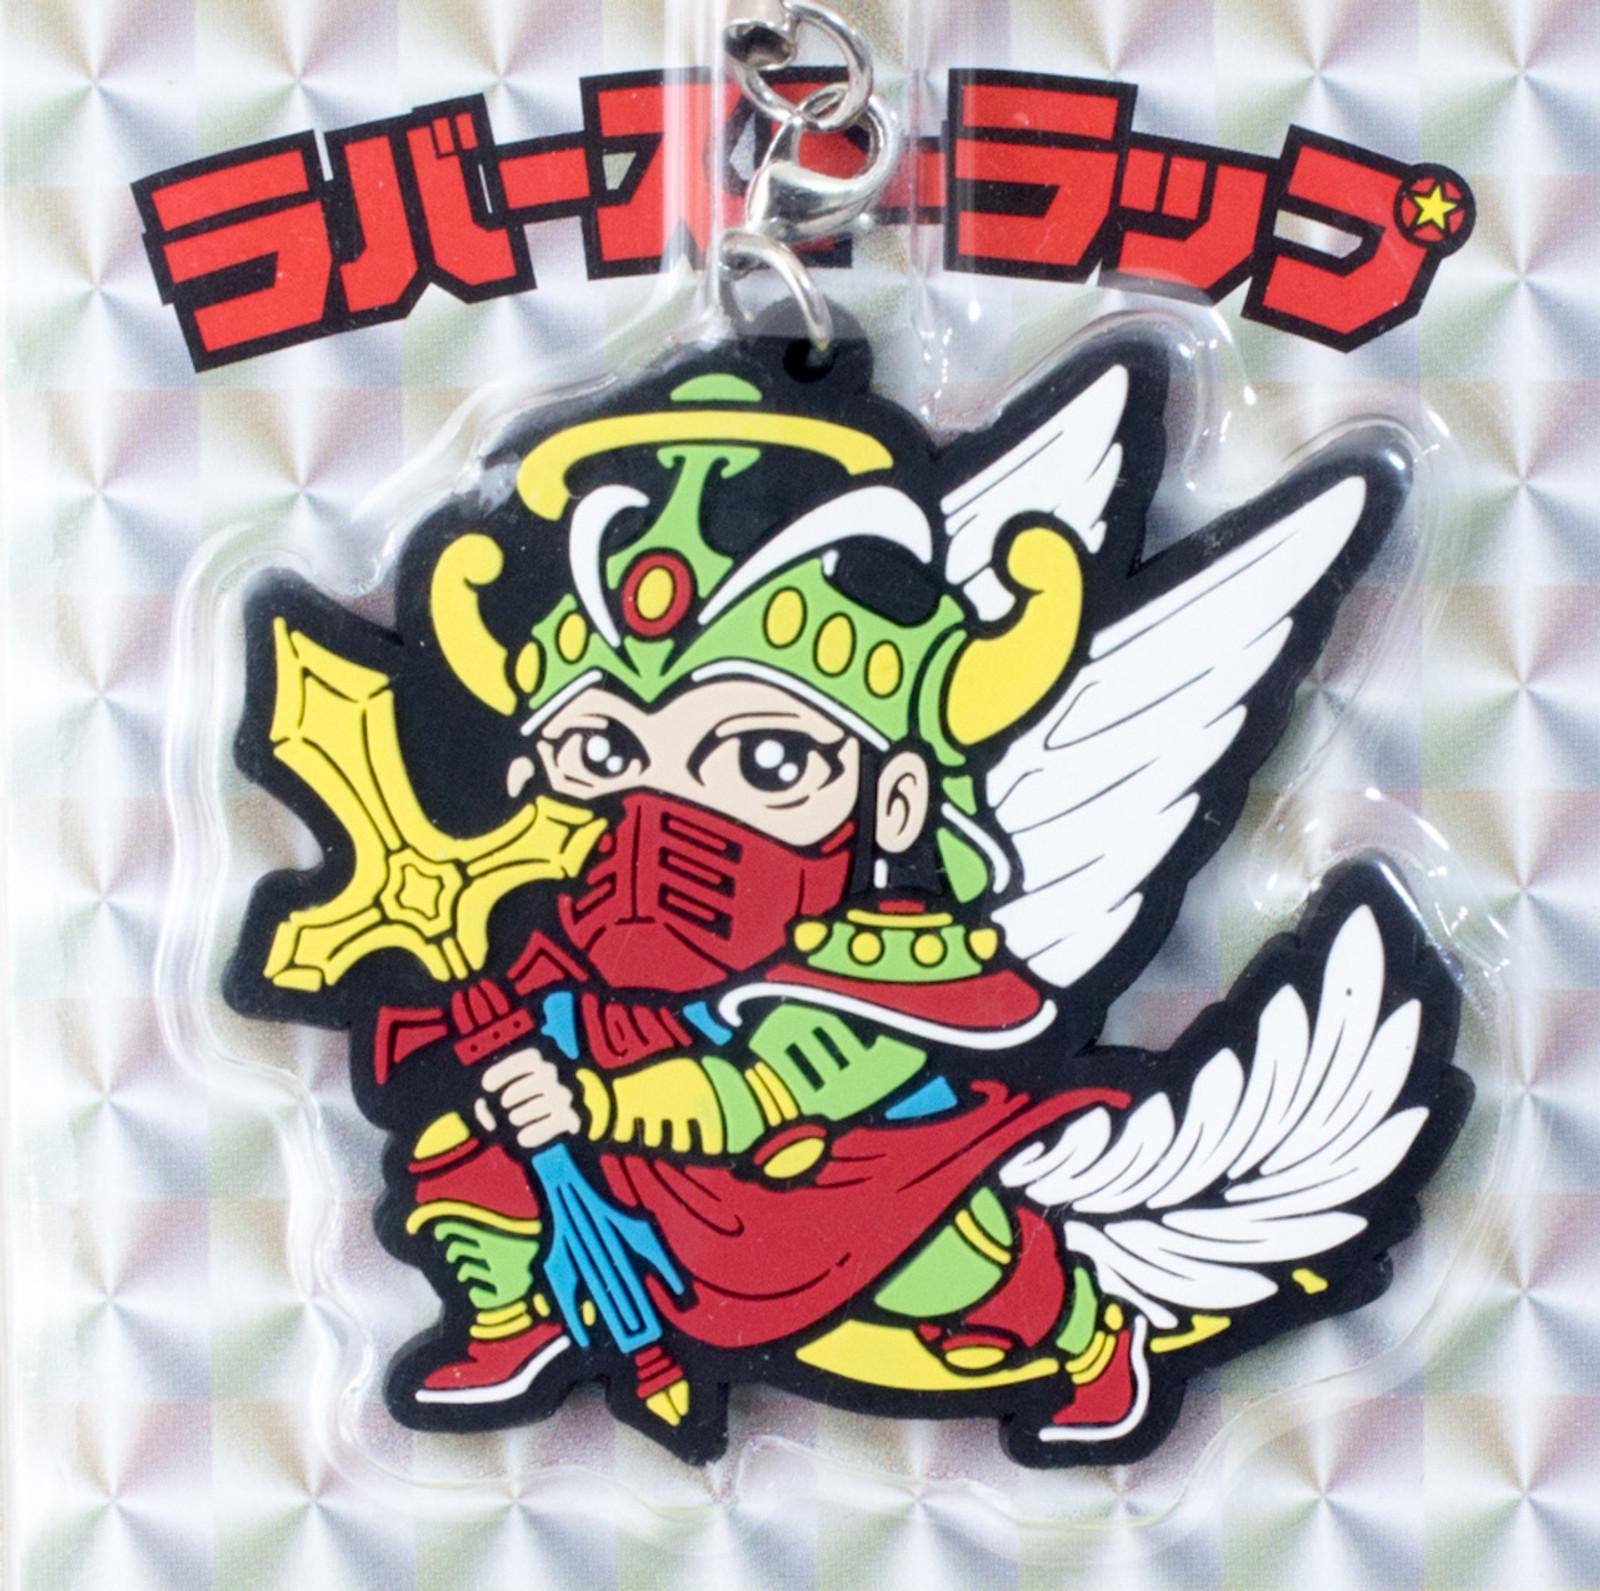 Bikkuriman Saint Phoenix Mascot Rubber Strap JAPAN ANIME MANGA